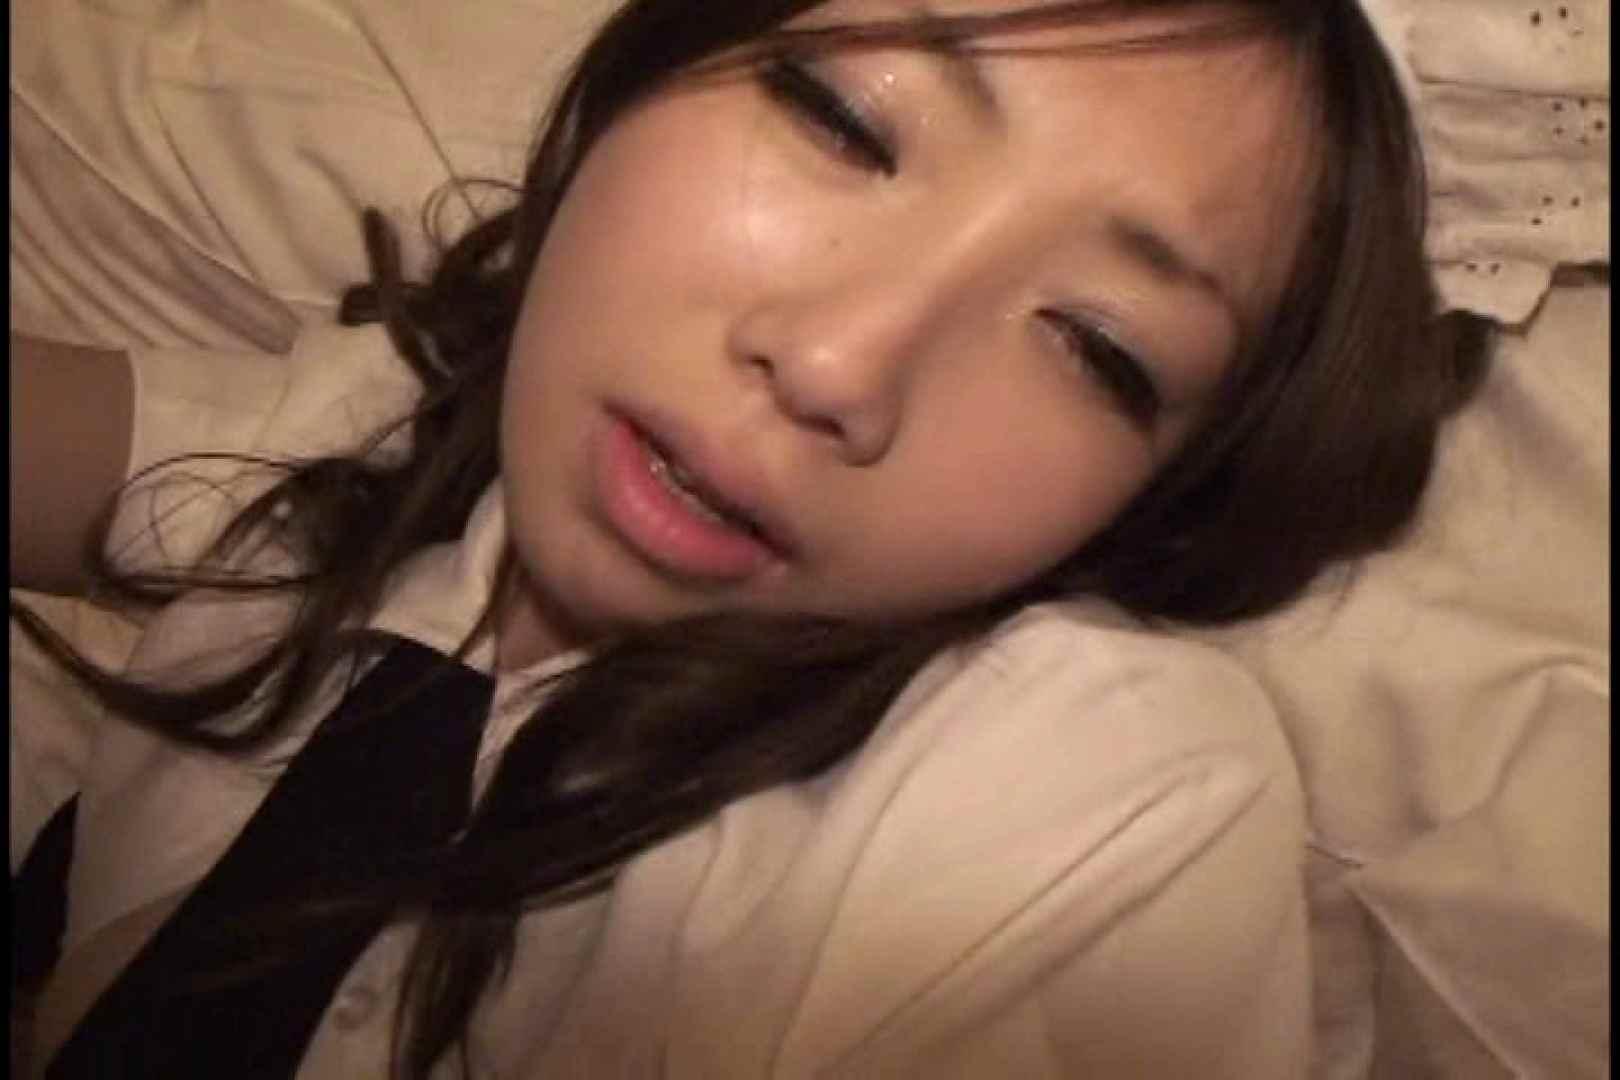 JDハンター全国ツアー vol.041 前編 女子大生のエロ動画  85PIX 10